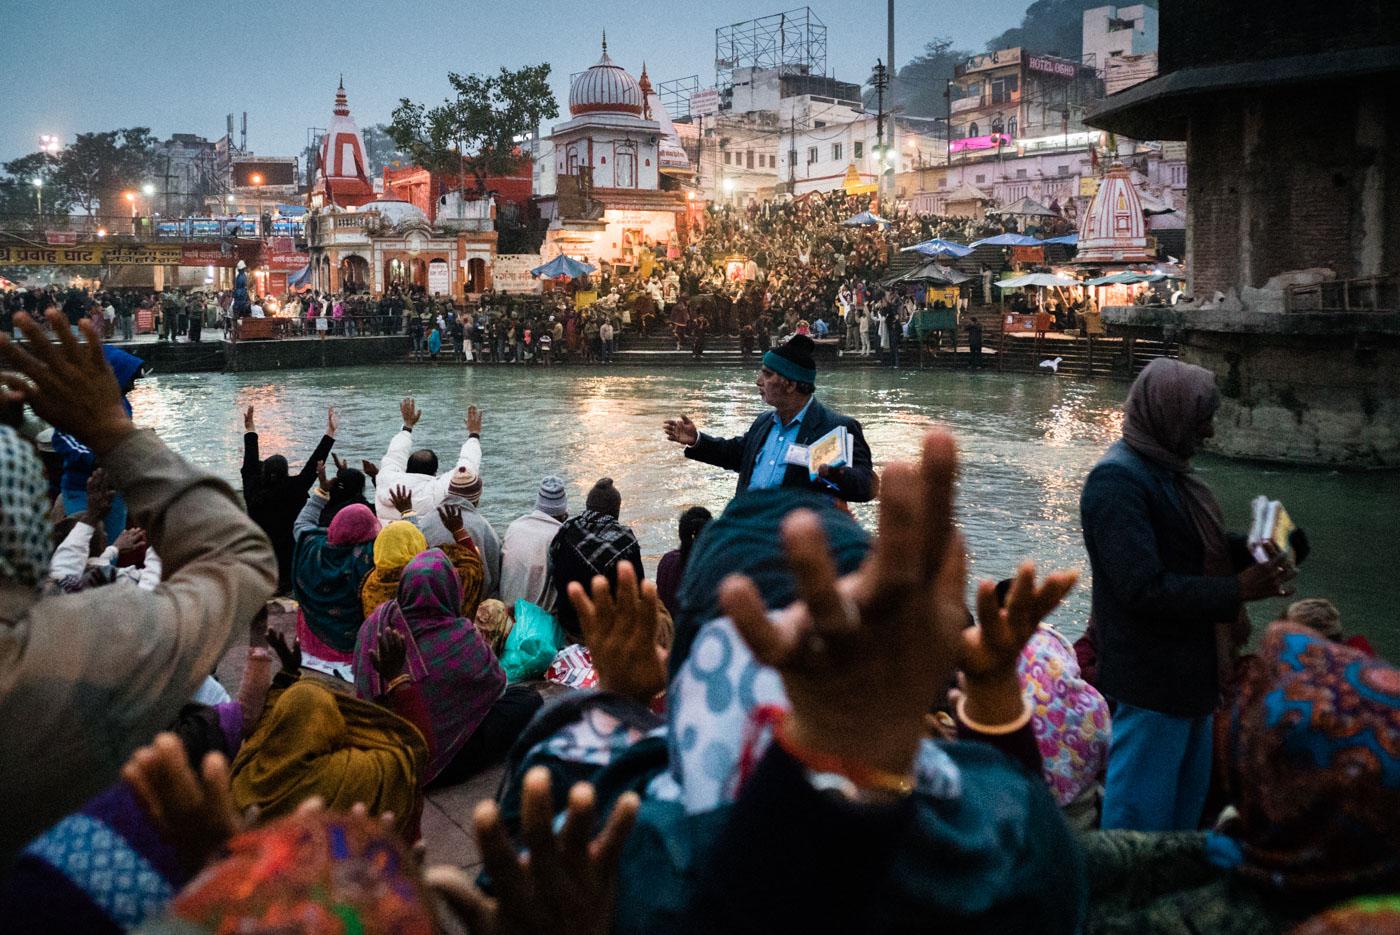 Ganges Aarti ceremony in Haridwar, India - Leica 21mm Super Elmar f/3.4